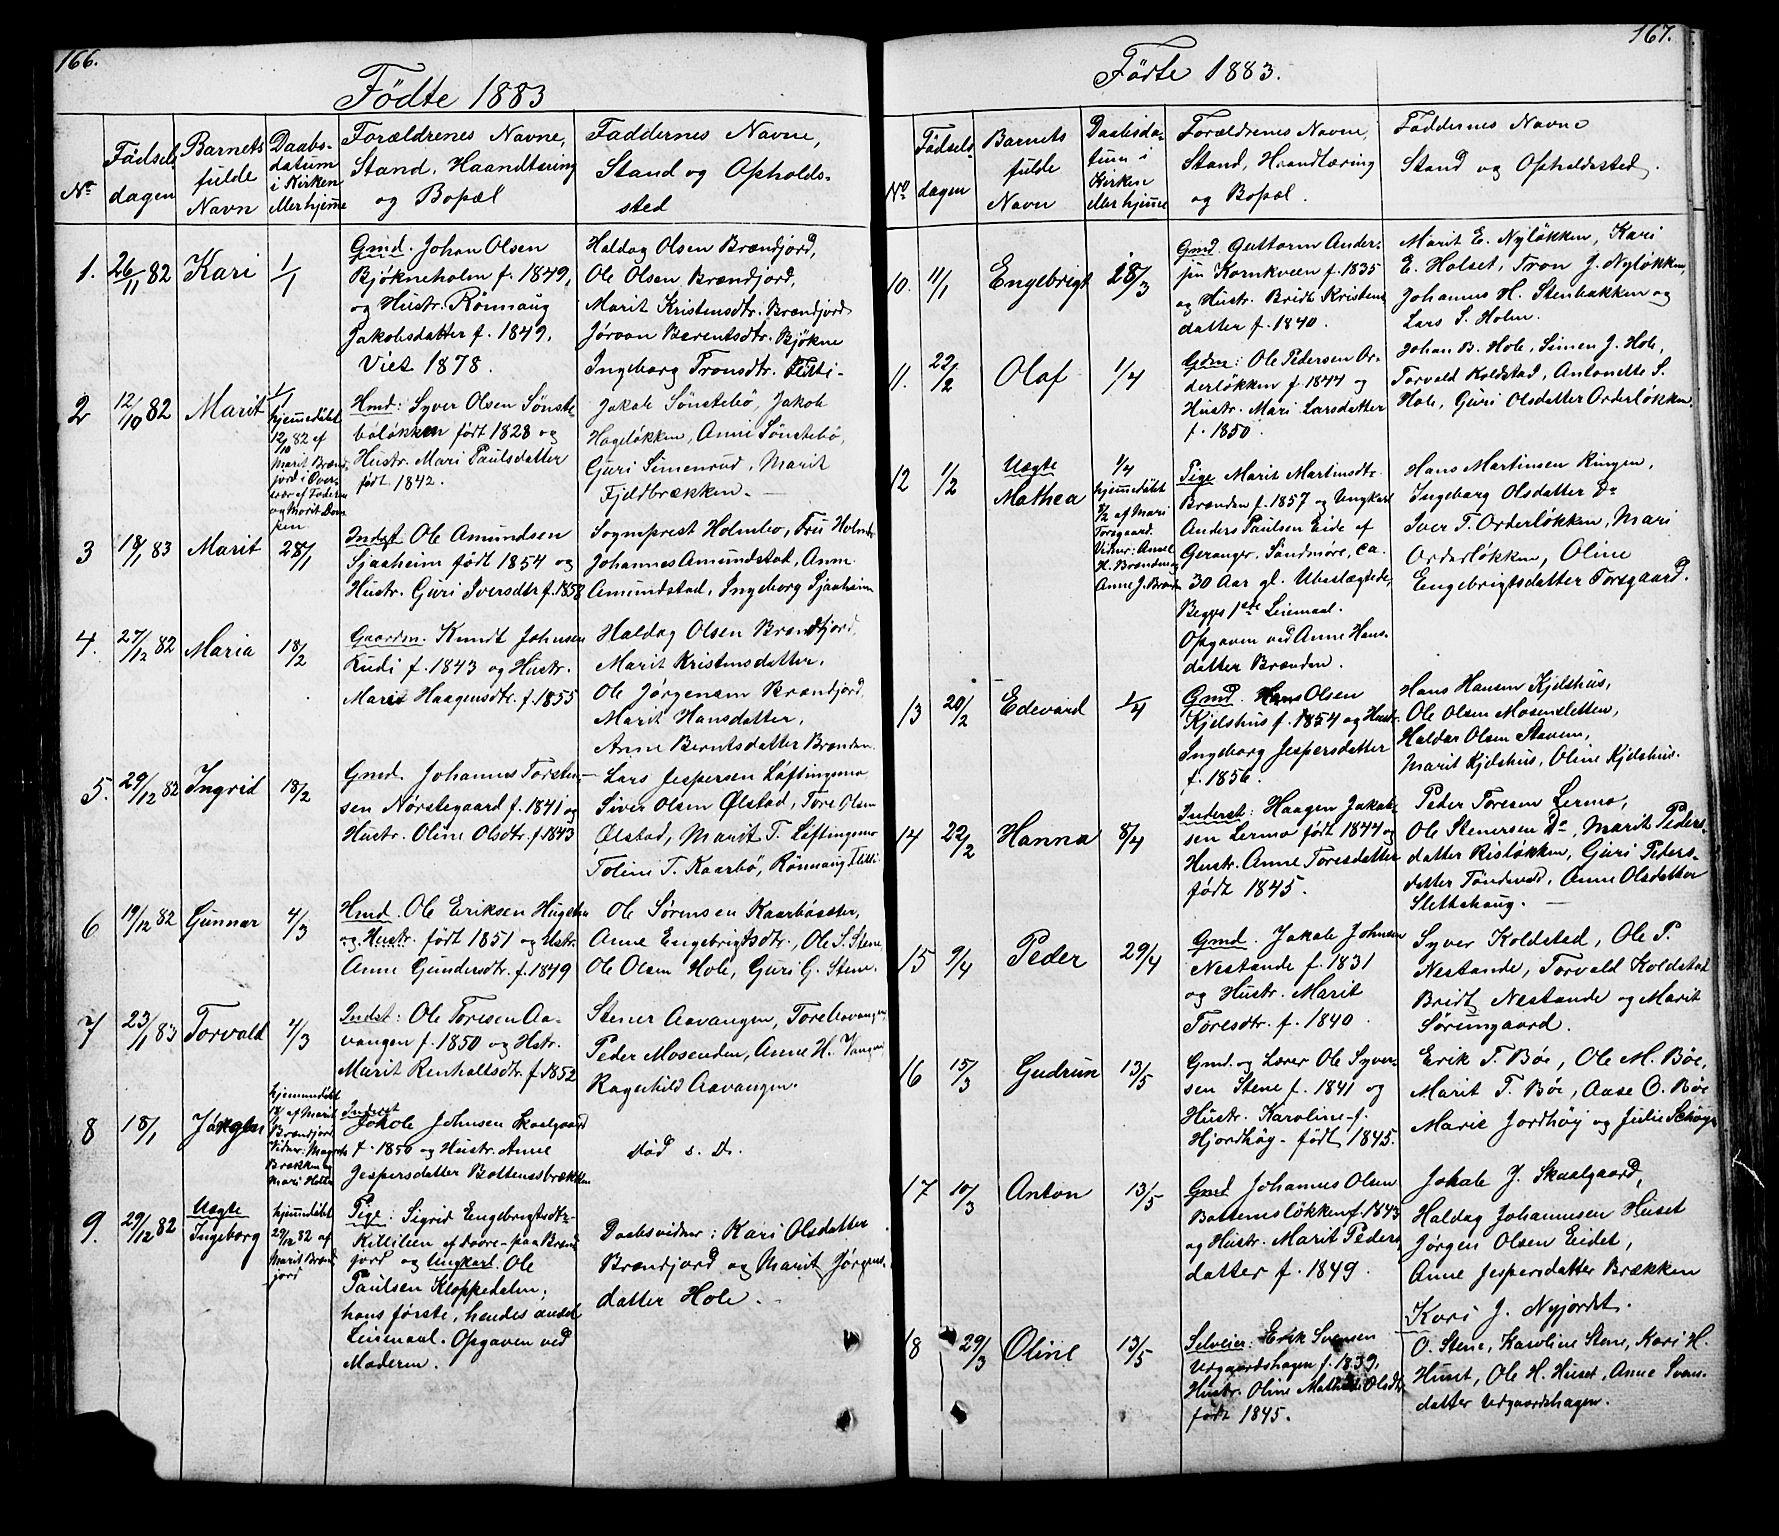 SAH, Lesja prestekontor, Klokkerbok nr. 5, 1850-1894, s. 166-167